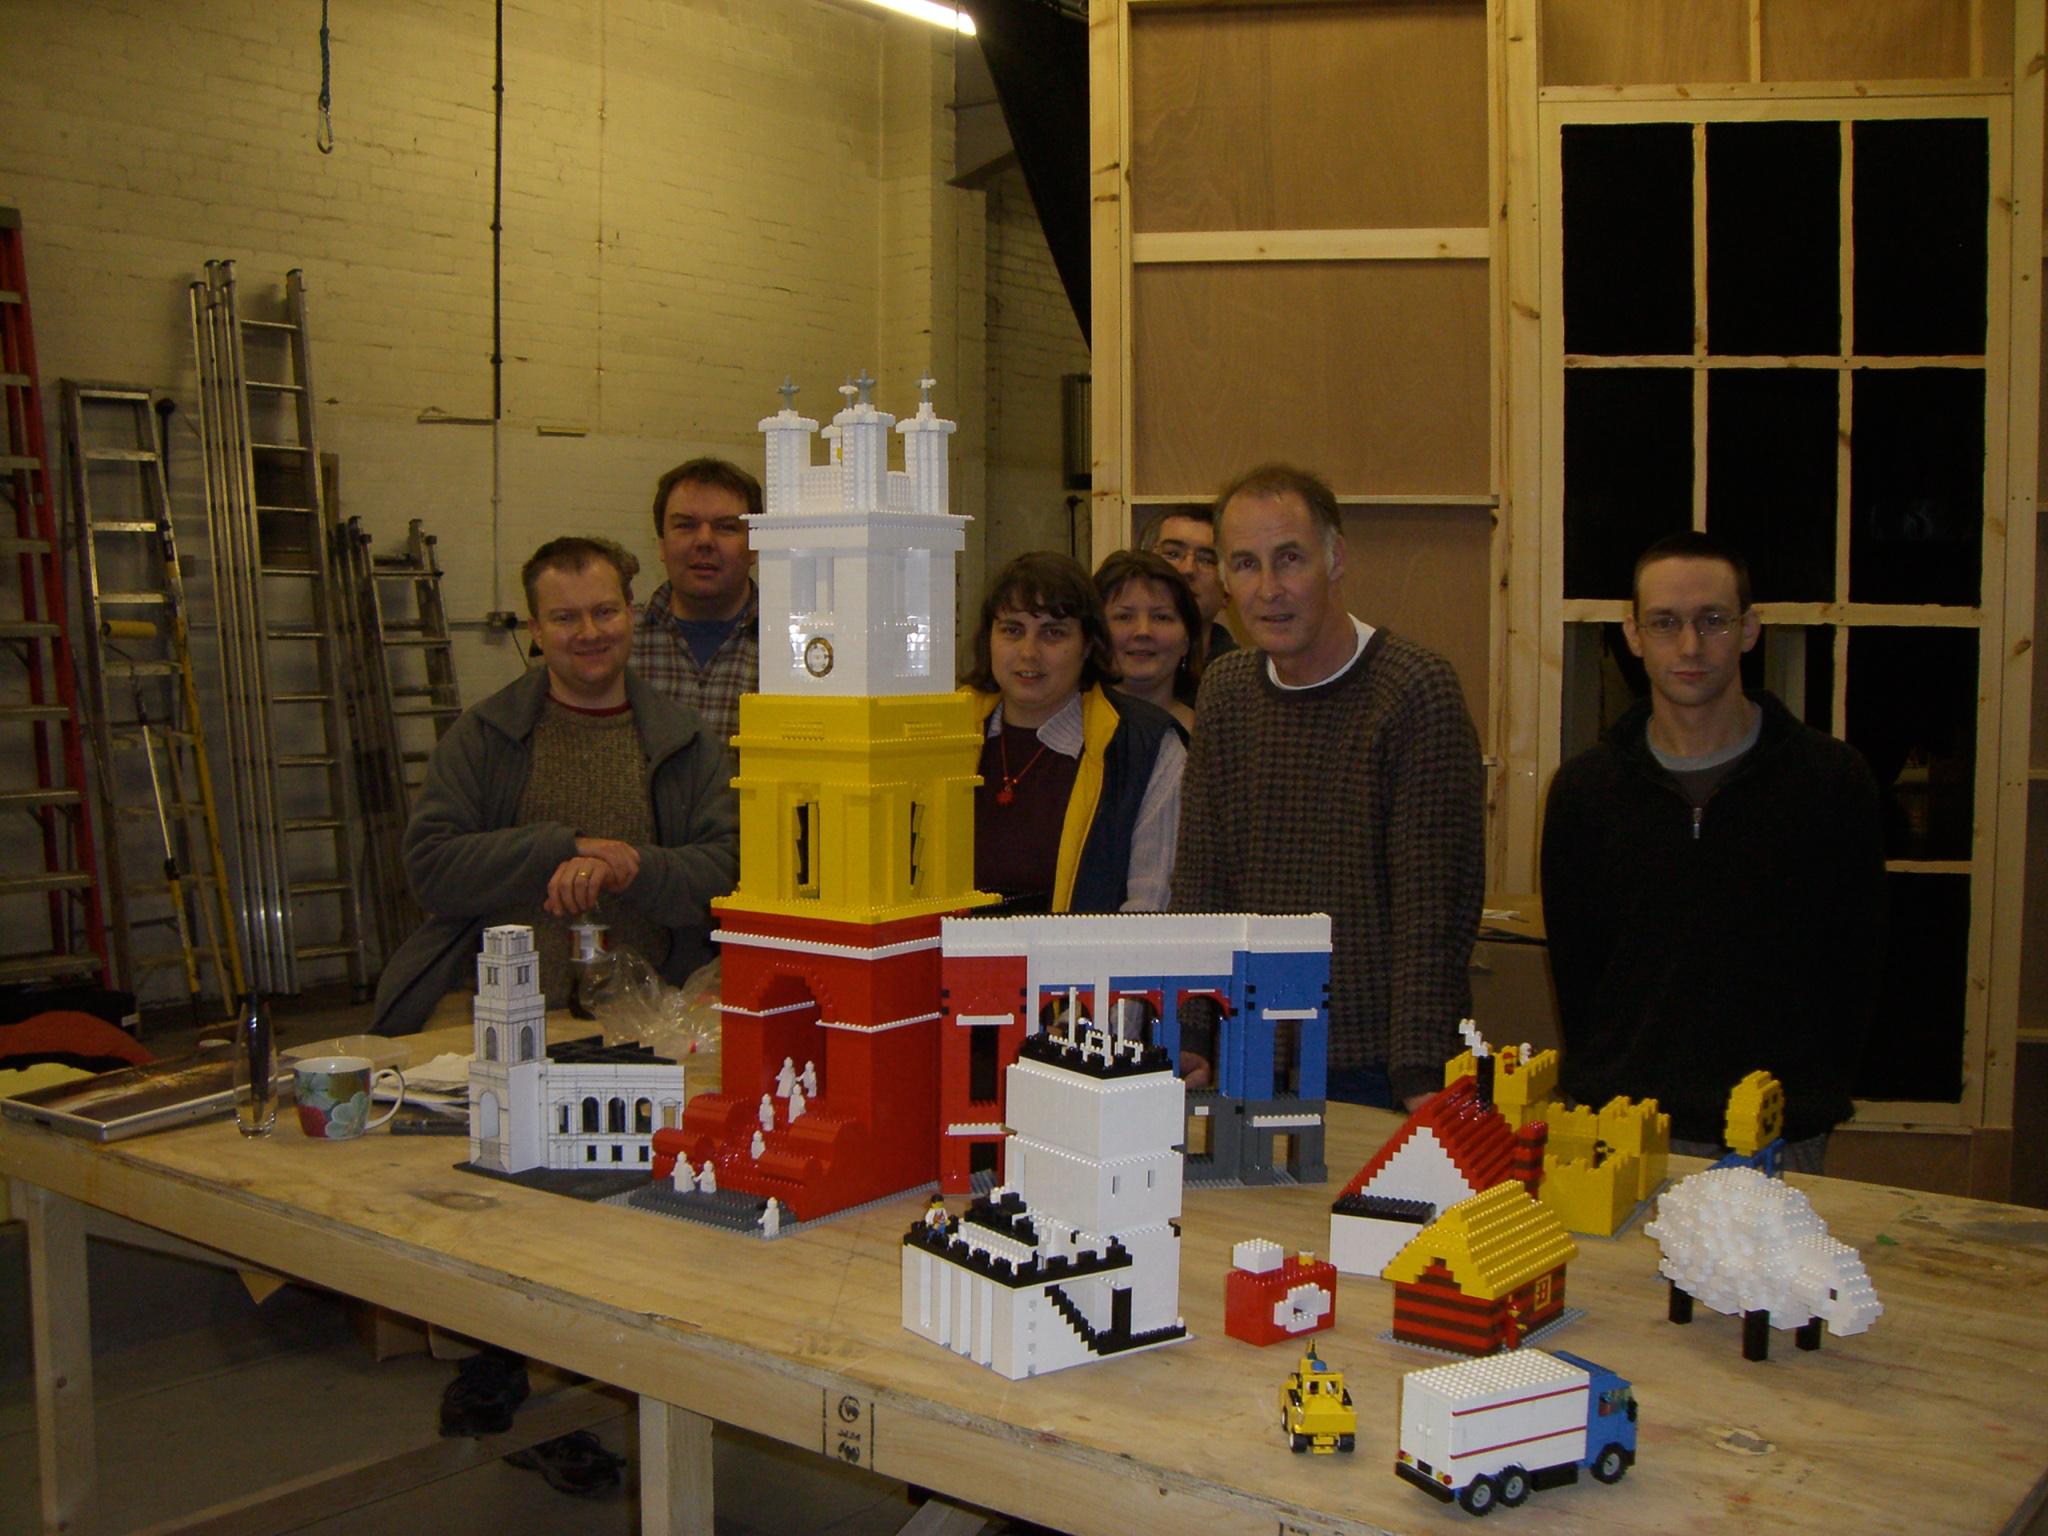 From left to right: Ed Hockaday, Steven Locke, Sian Hockaday, Teresa Elsmore, Me, David Graham and David Mackenzie